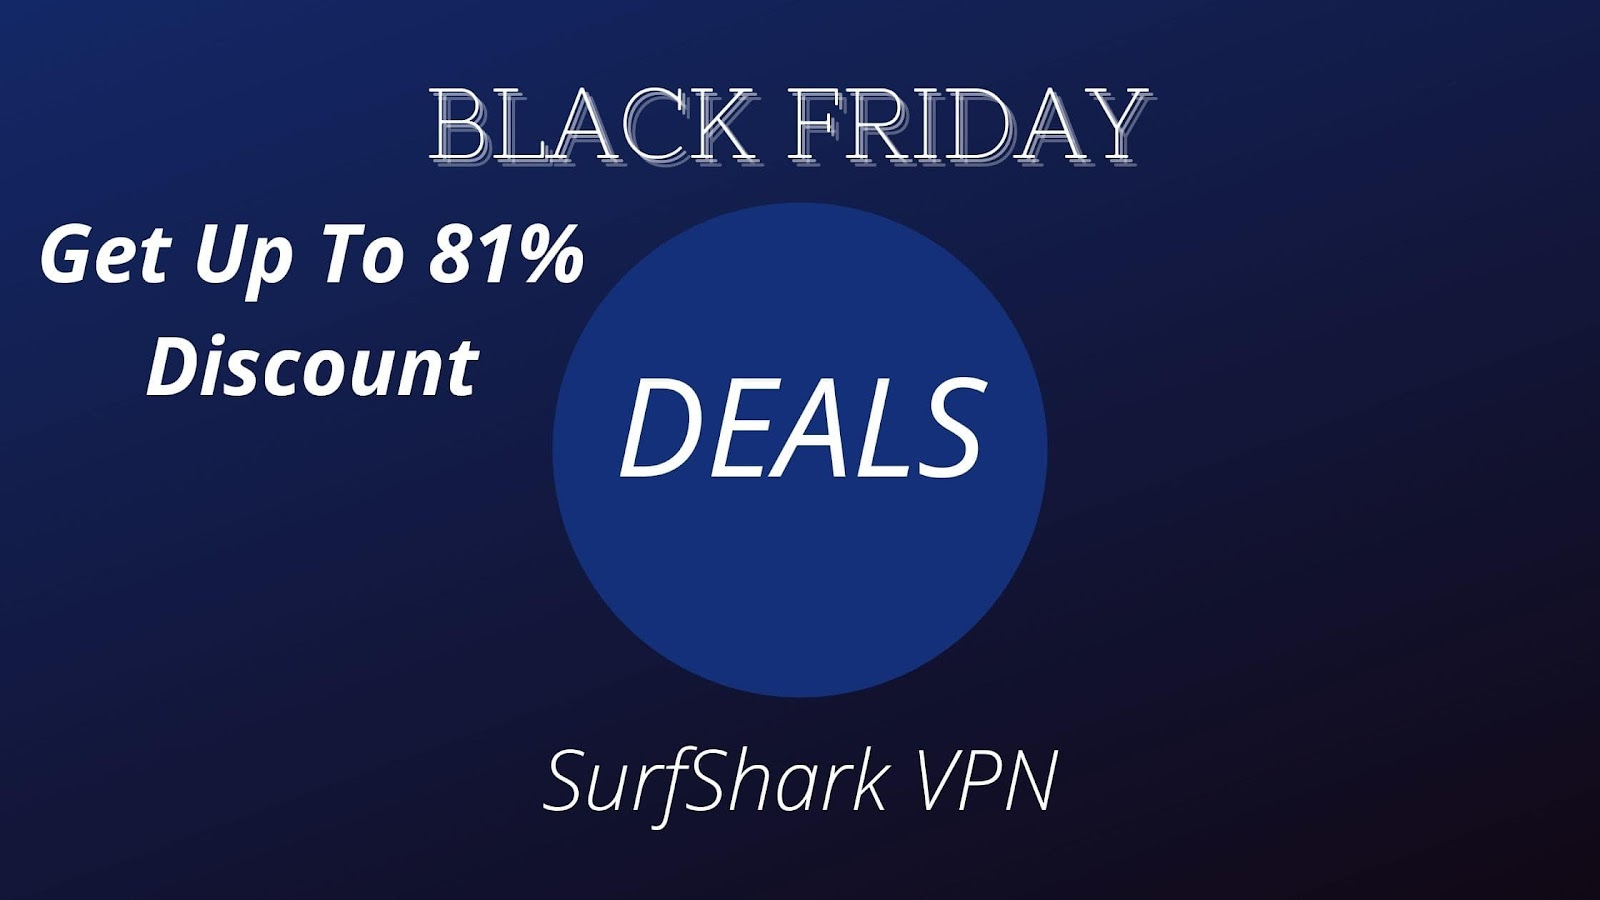 SurfShark VPN: Get Up TO 81% Off